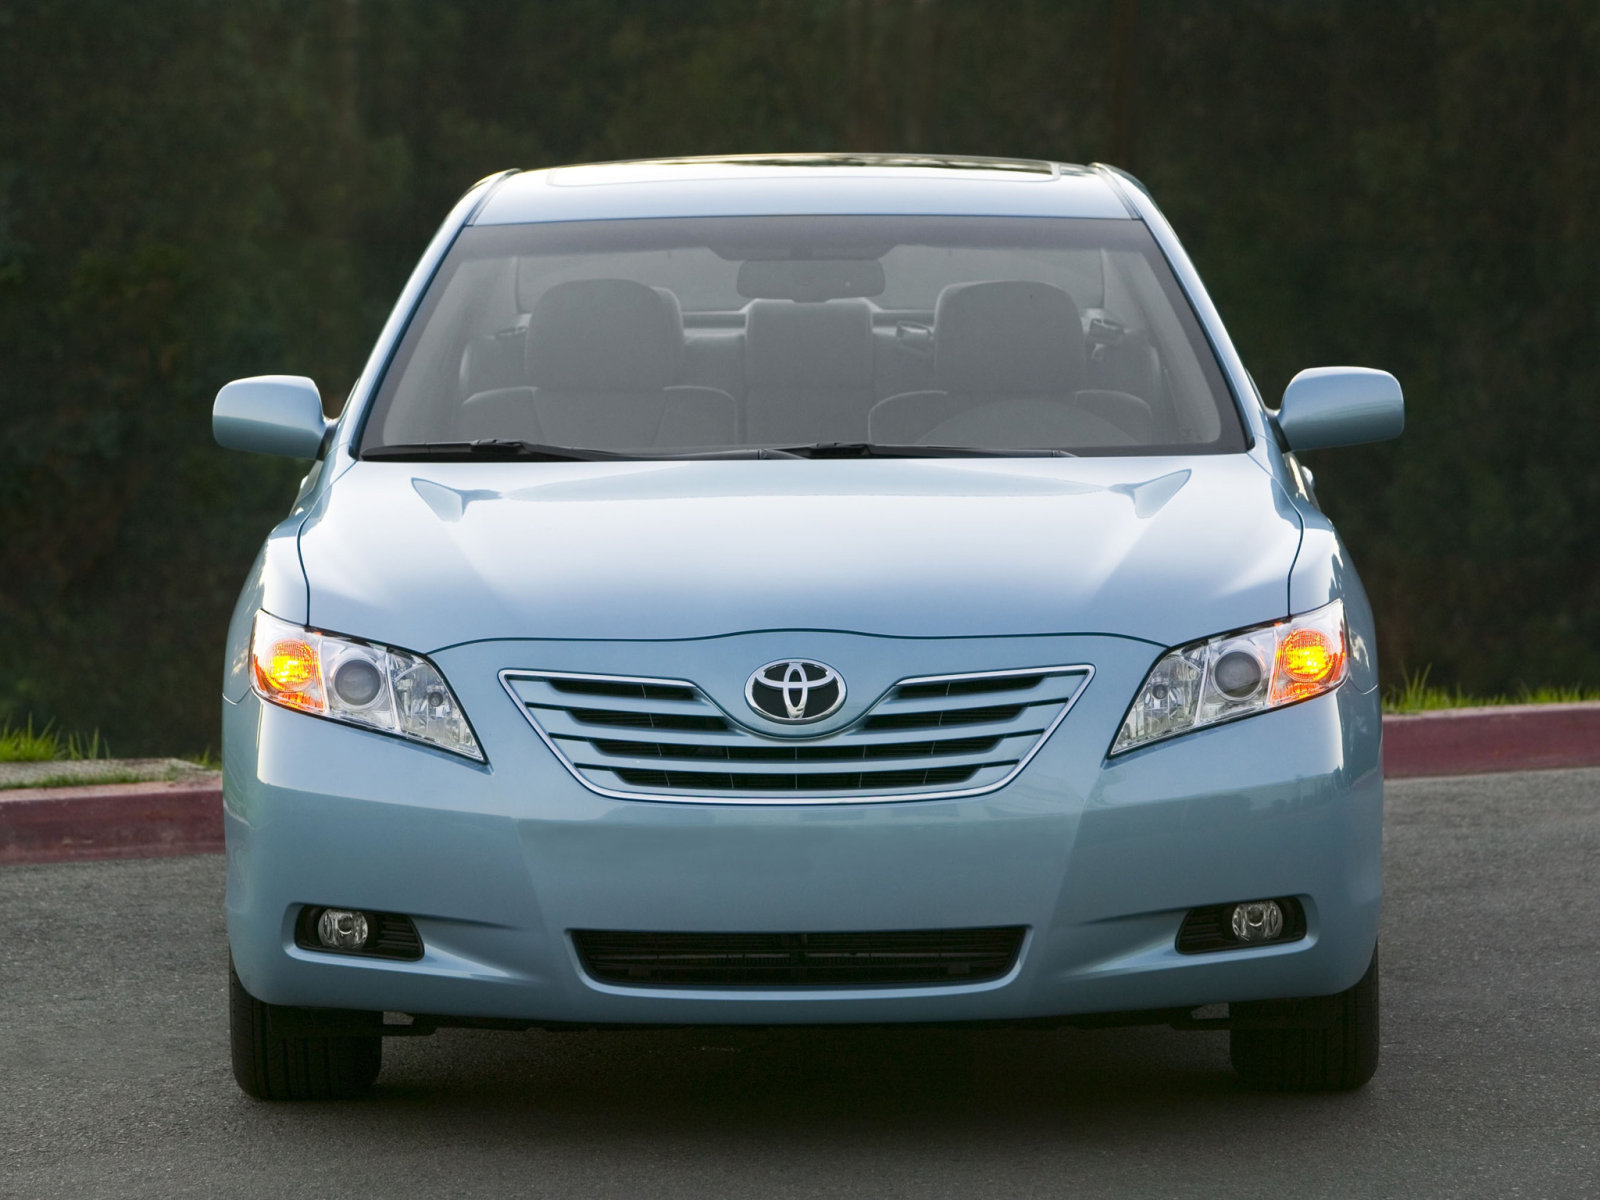 Автокаталог. Фото Toyota Camry VI 2.4 i 16V VVT-i на Cheap-Auto.ru.